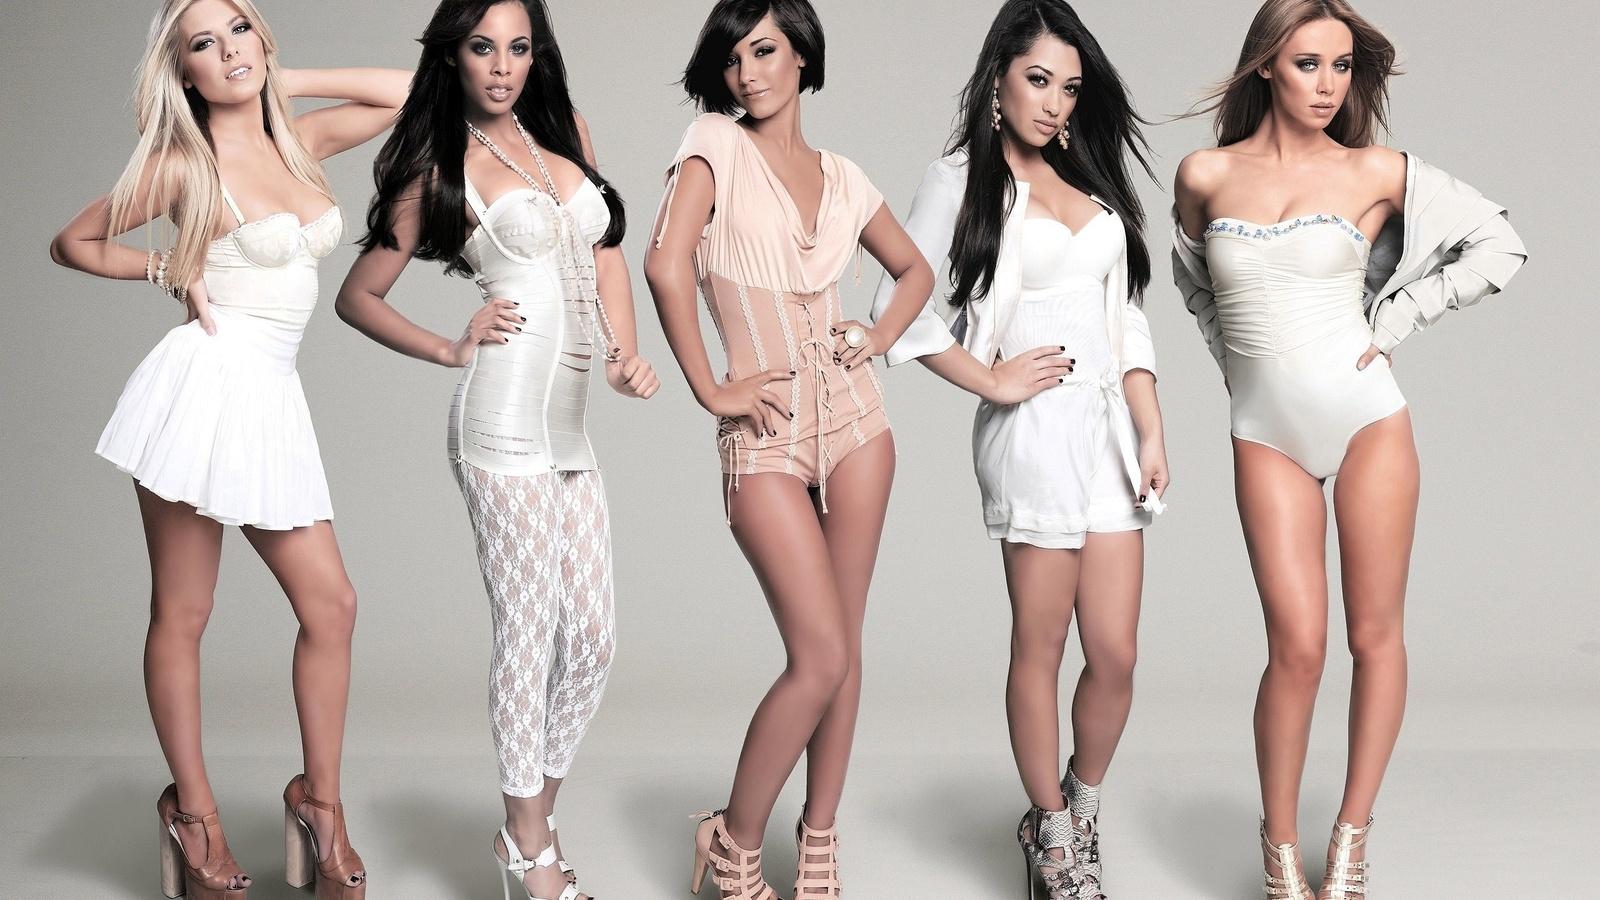 The Saturdays Vanessa White Boobs In See Through Dress